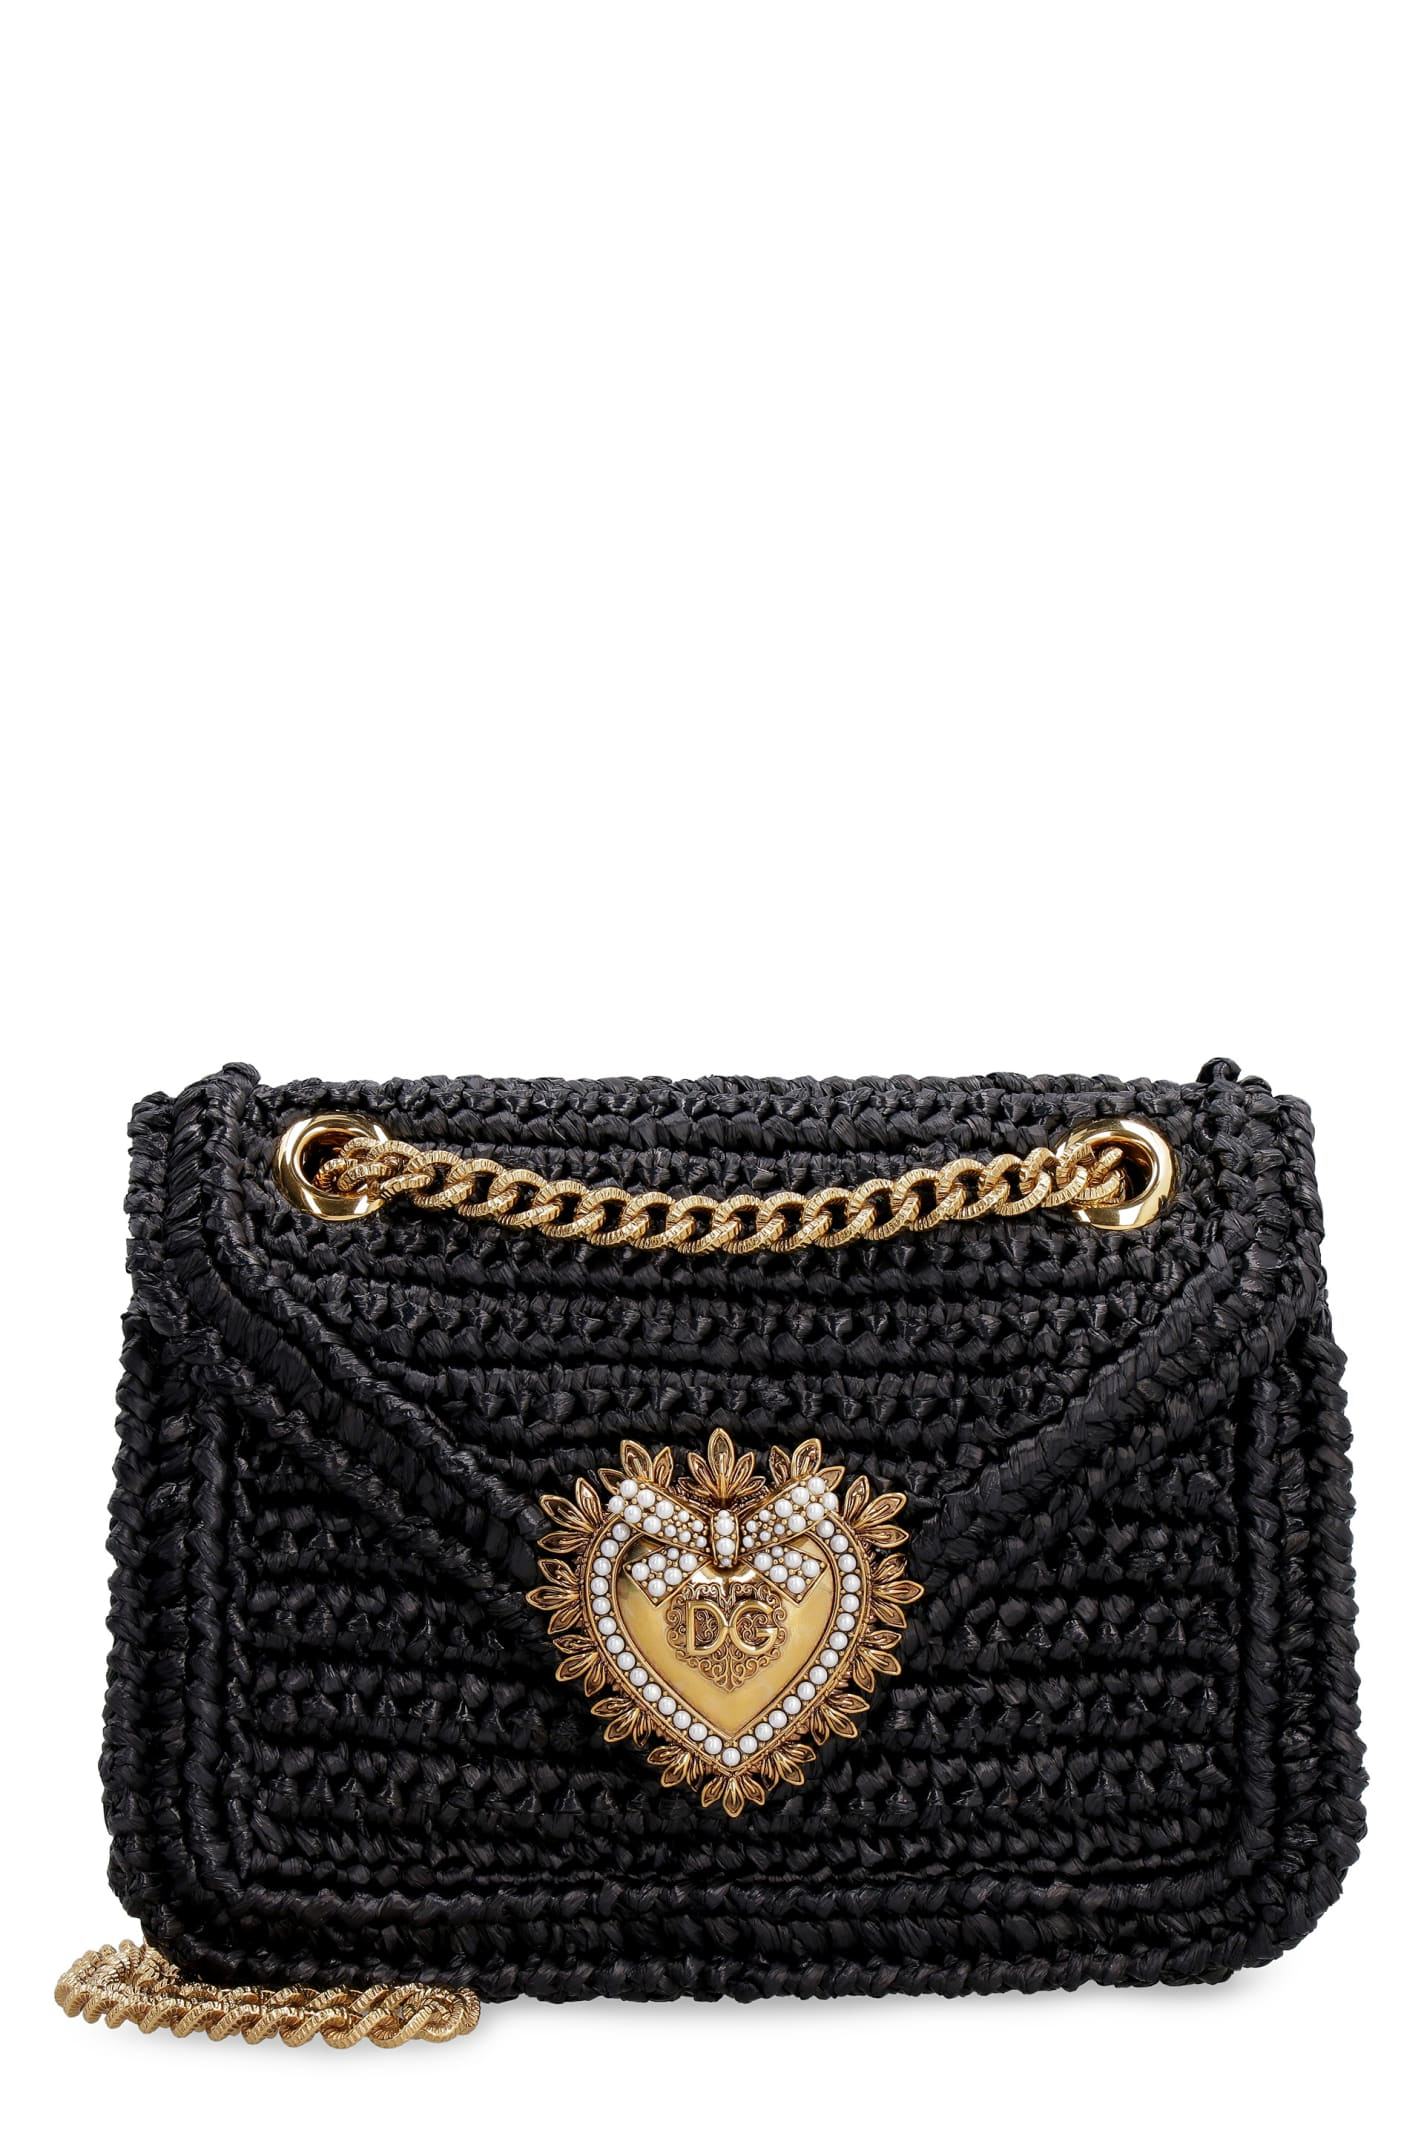 Dolce & Gabbana DEVOTION RAFFIA BAG